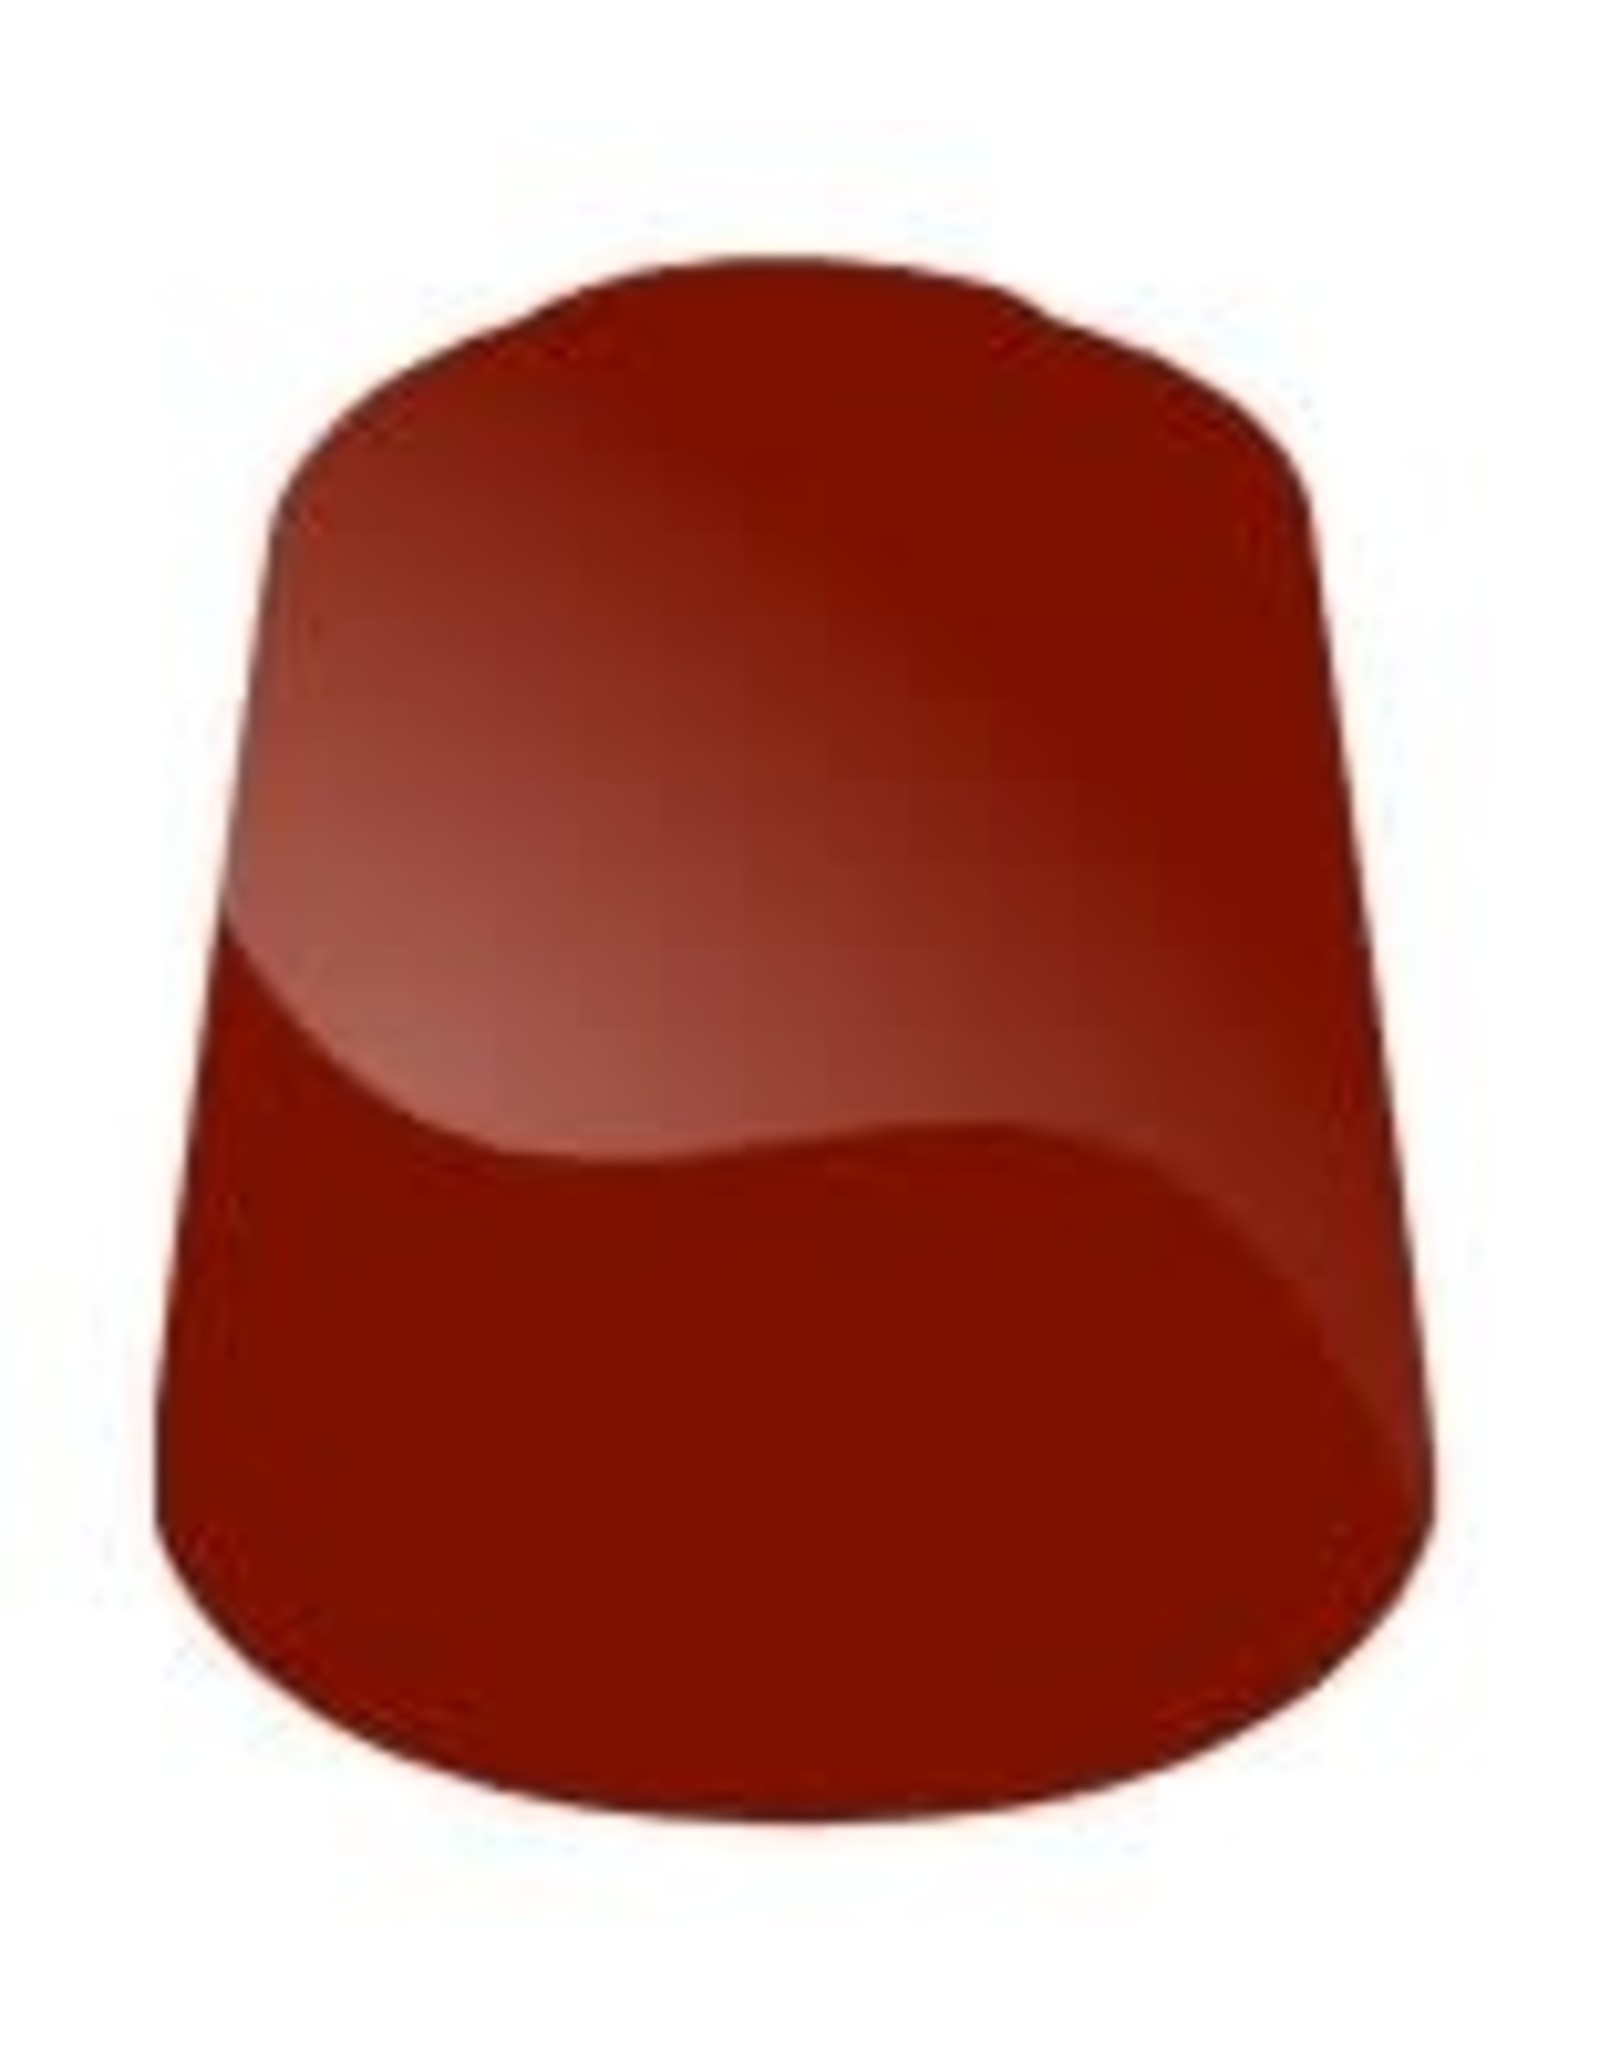 Games Workshop Citadel - Technical: Spiritstone Red (12 ml)